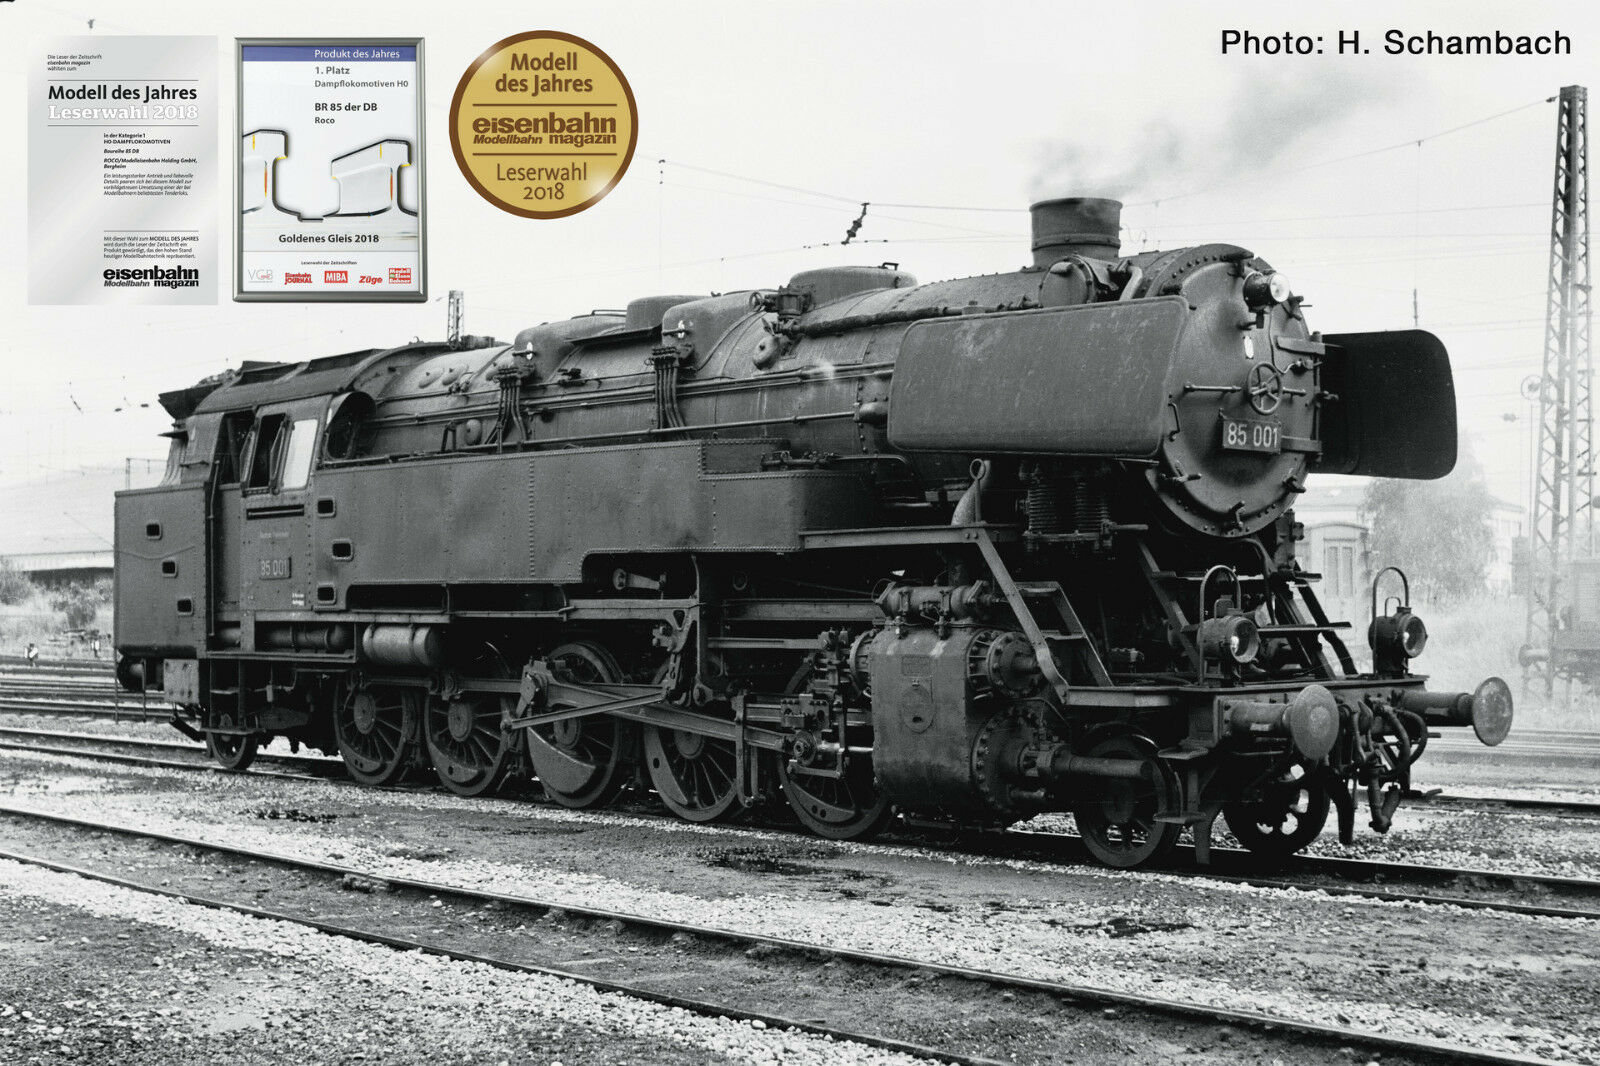 ROCO ROCO ROCO 72263 DC, locomotiva 85 001, DB, Digital Sound Dyn. vapore, novità 2018 ausverk. 9fbb6a